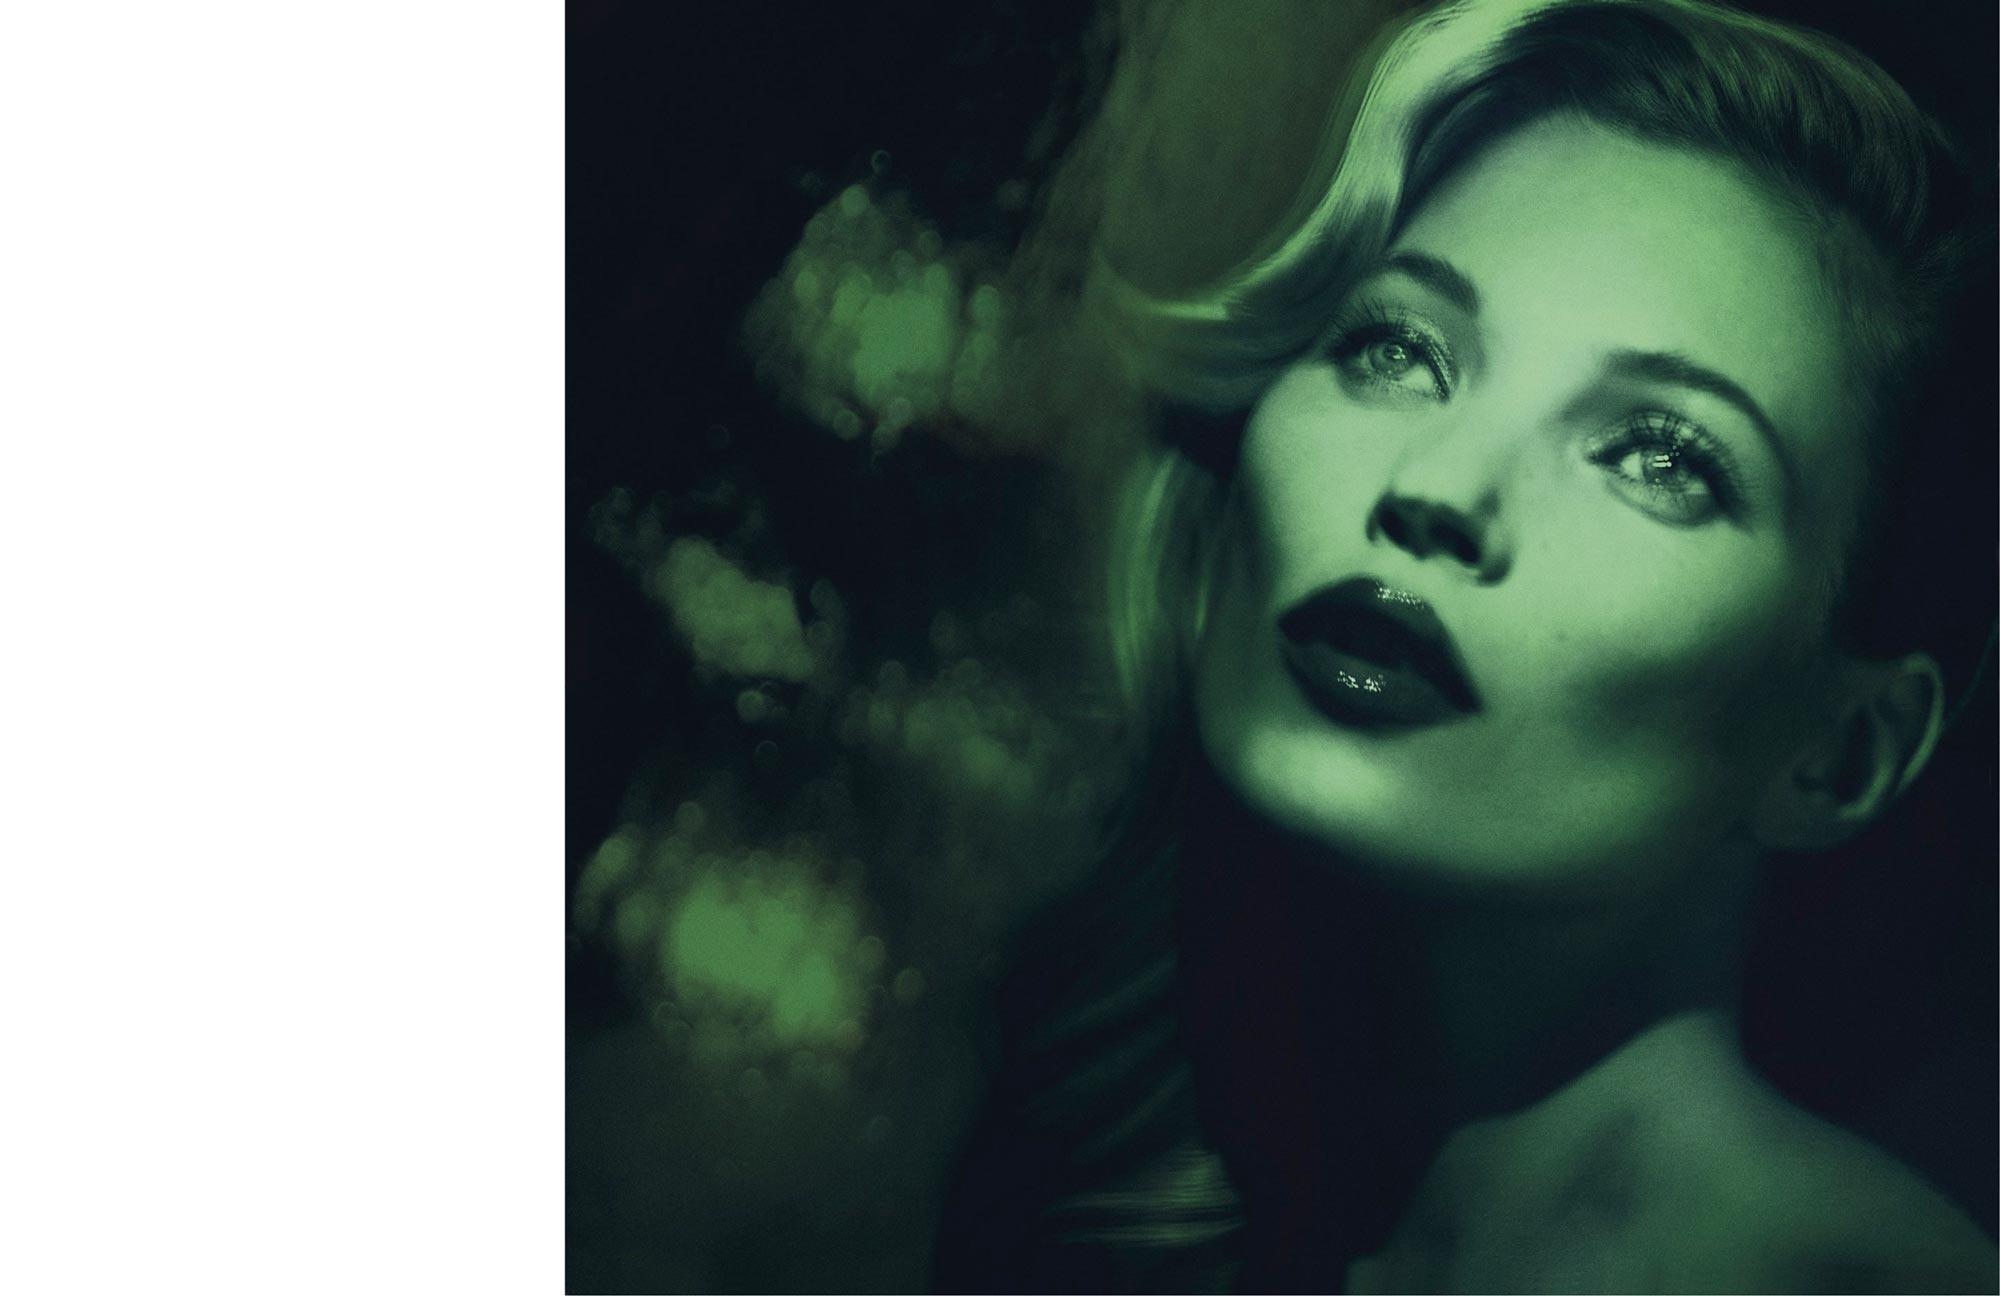 Kate Moss - Mert & Marcus